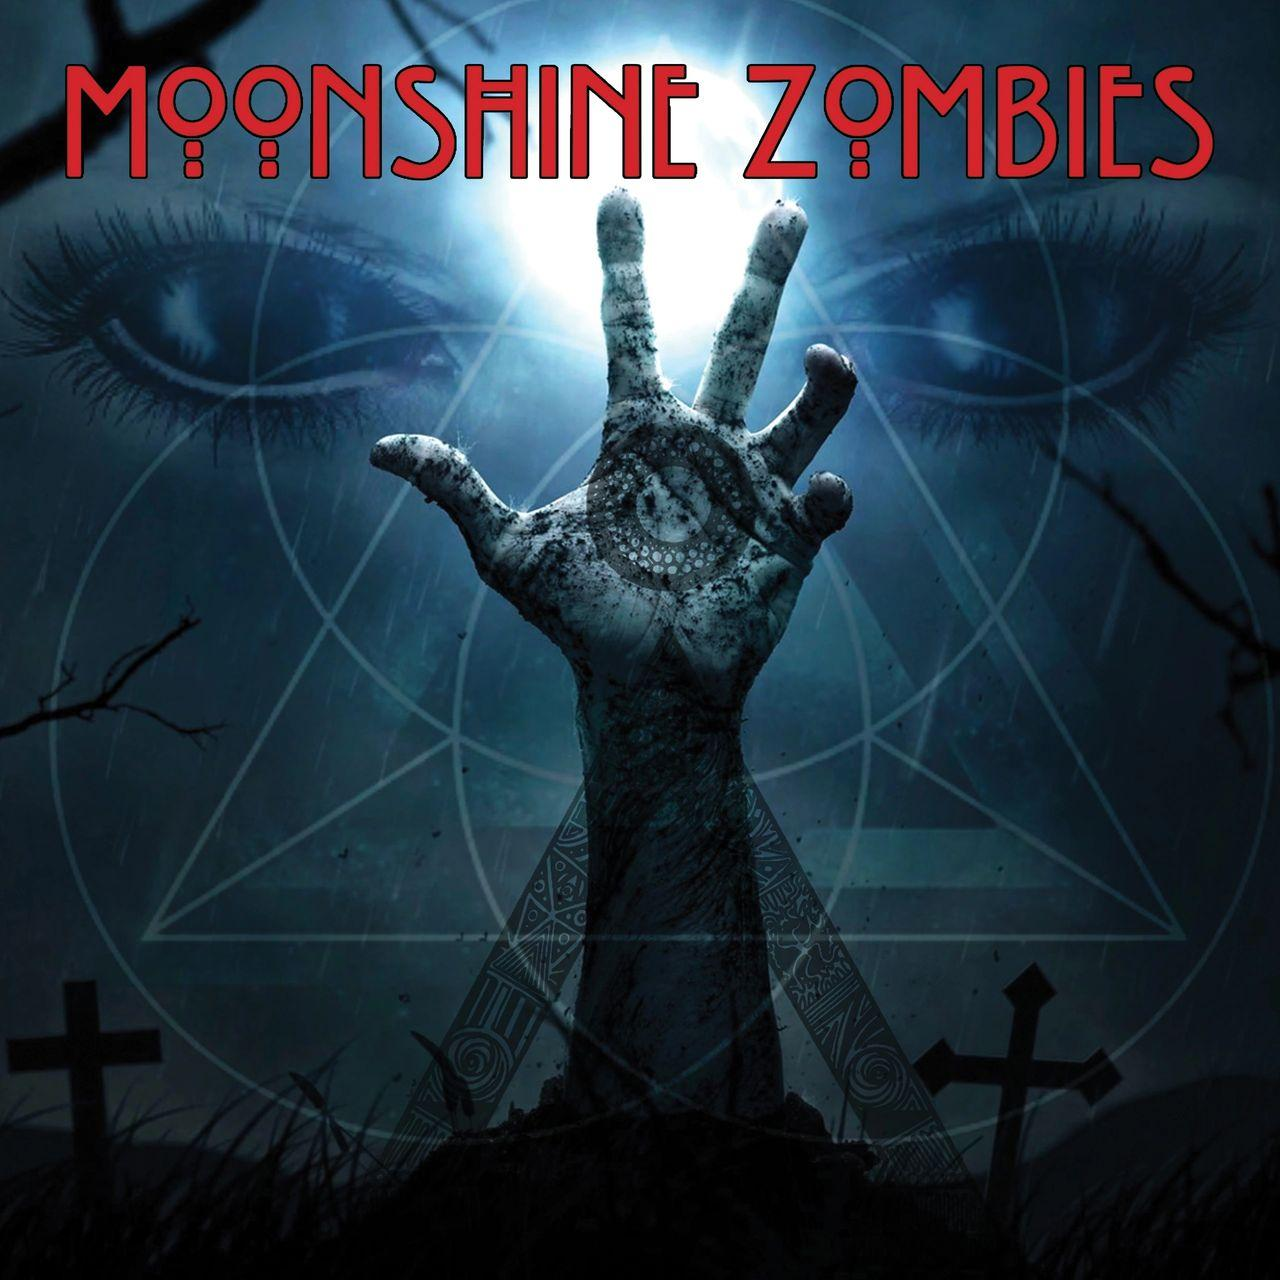 Moonshine zombies self titled